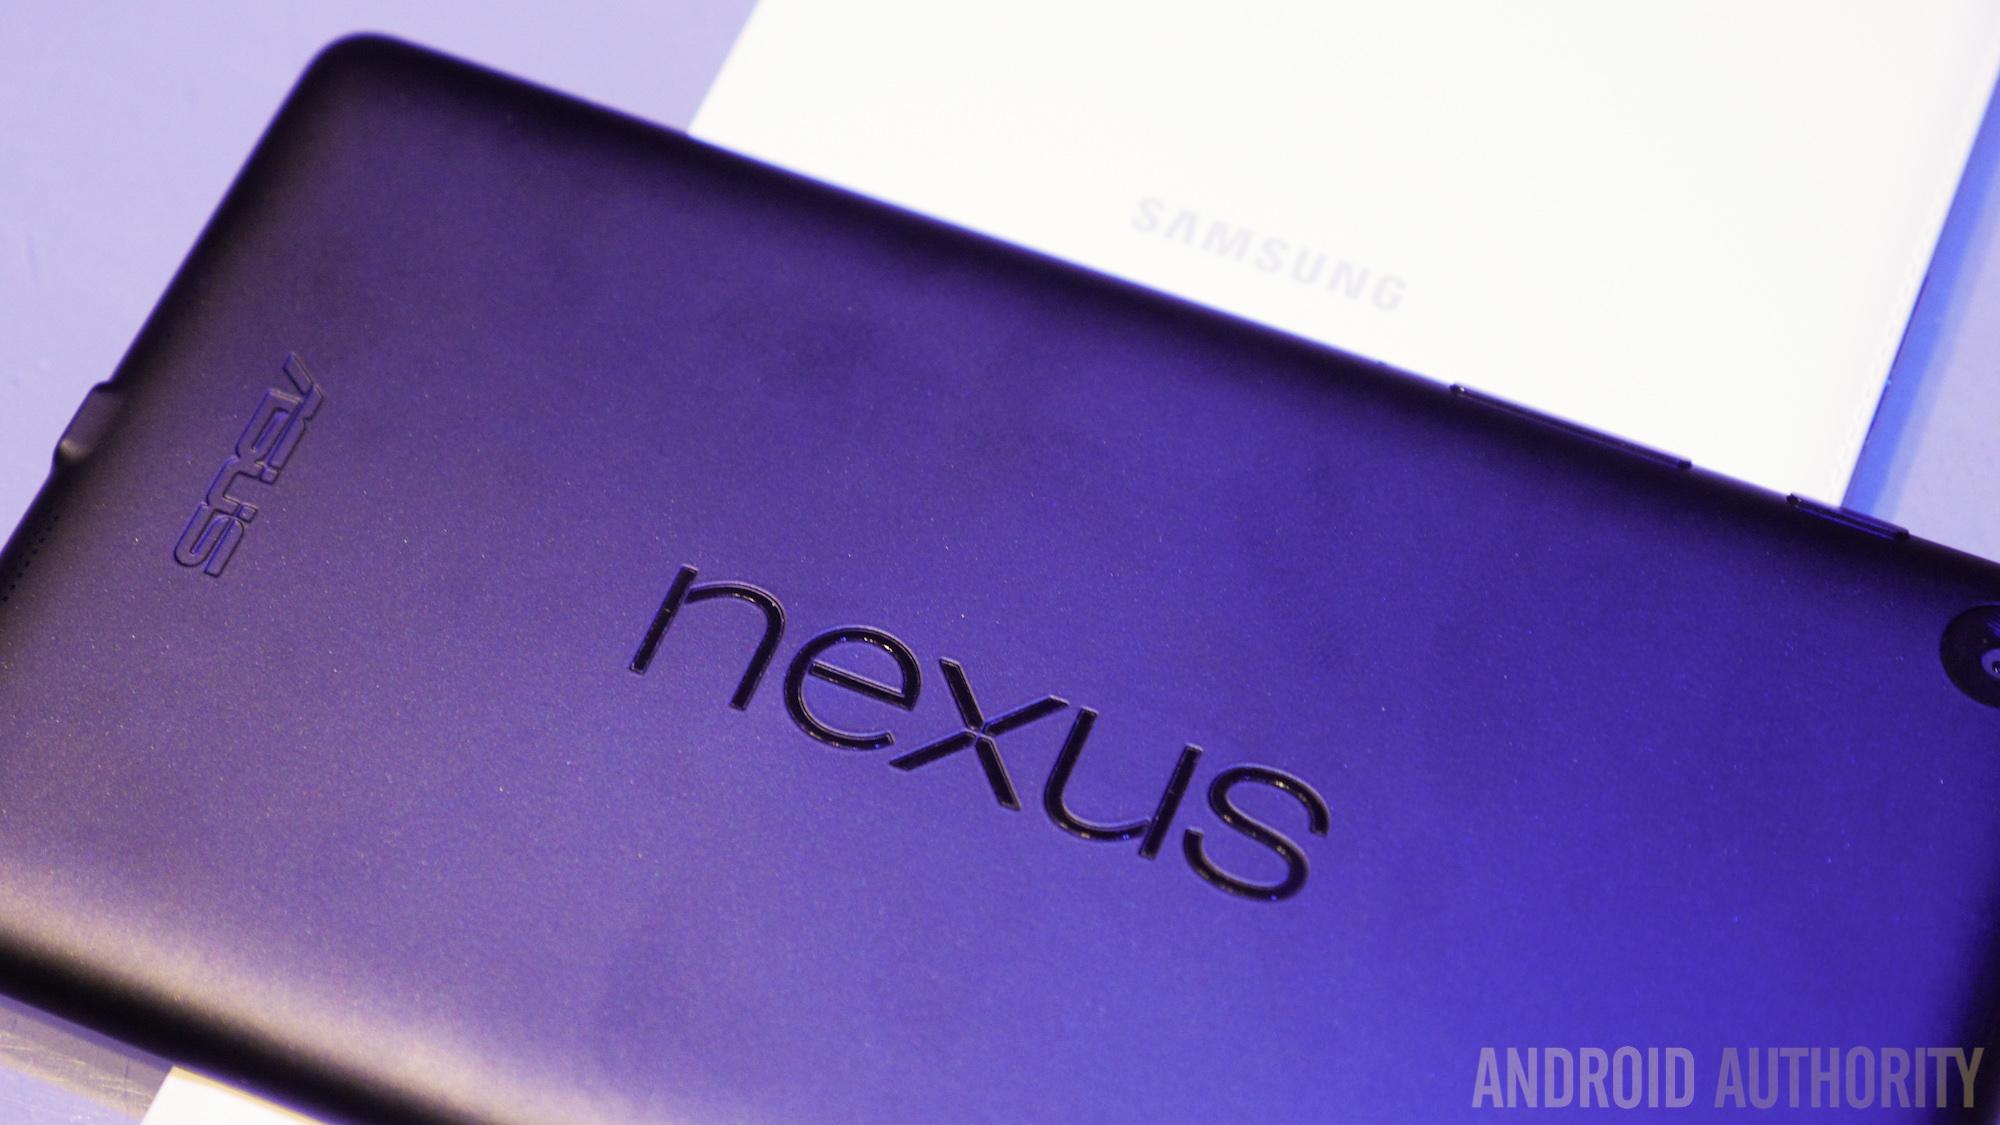 Samsung Galaxy TabPro 8.4 vs Nexus 7 2013